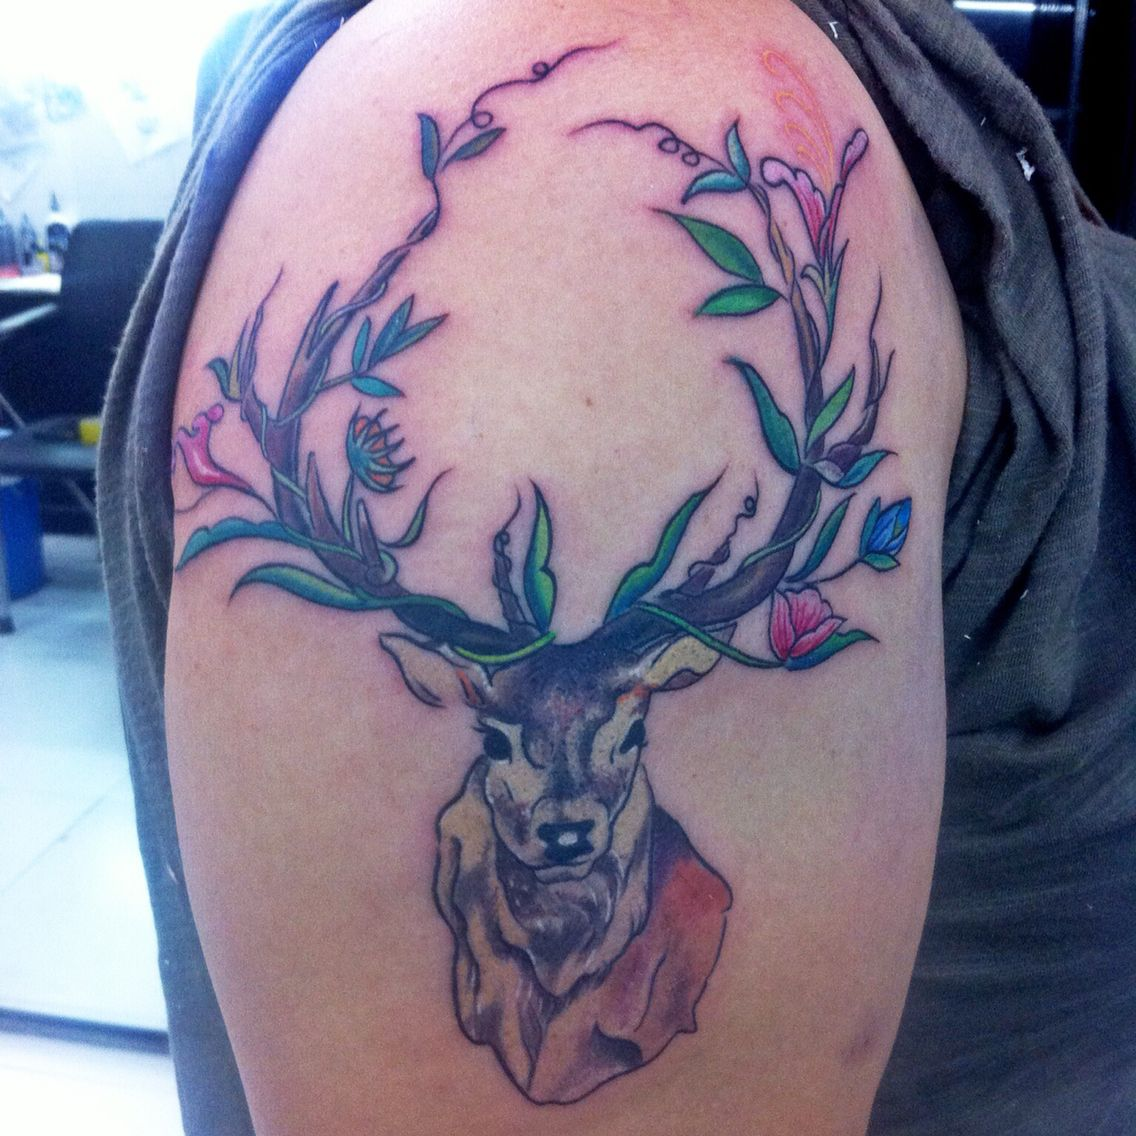 My Deer Tattoo..